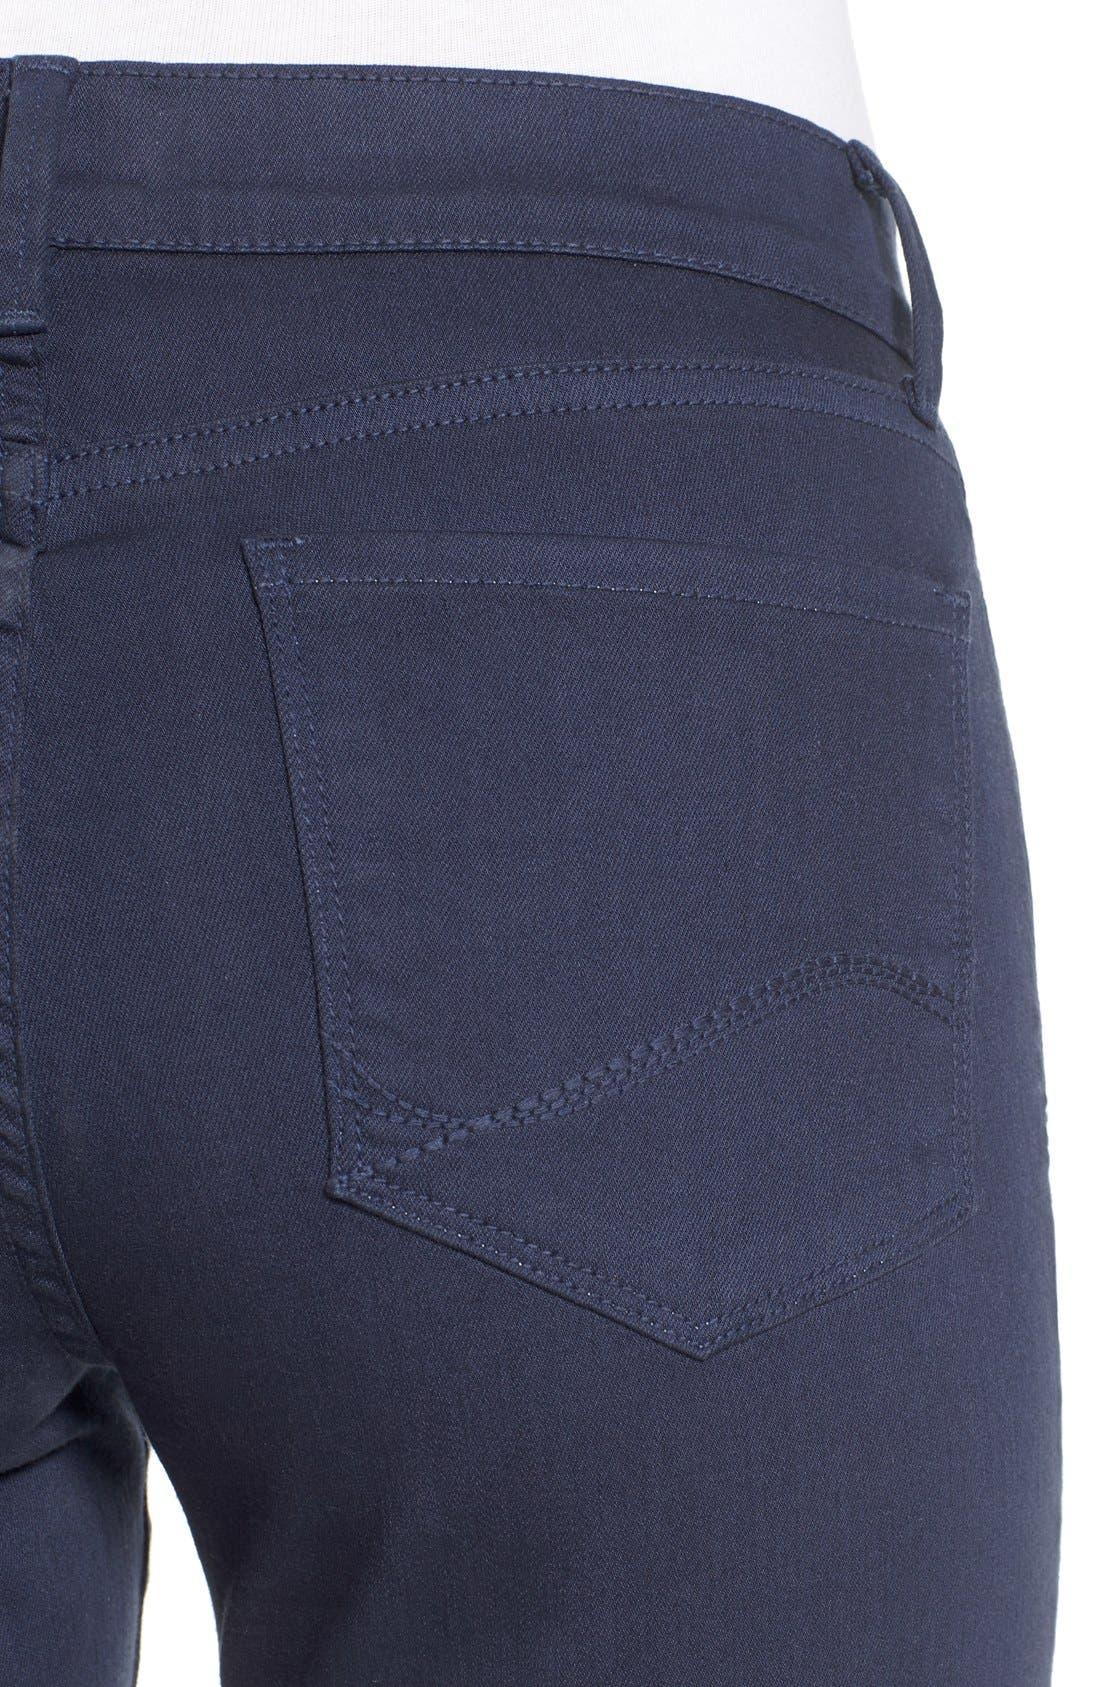 'Dayla' Colored Wide Cuff Capri Jeans,                             Alternate thumbnail 21, color,